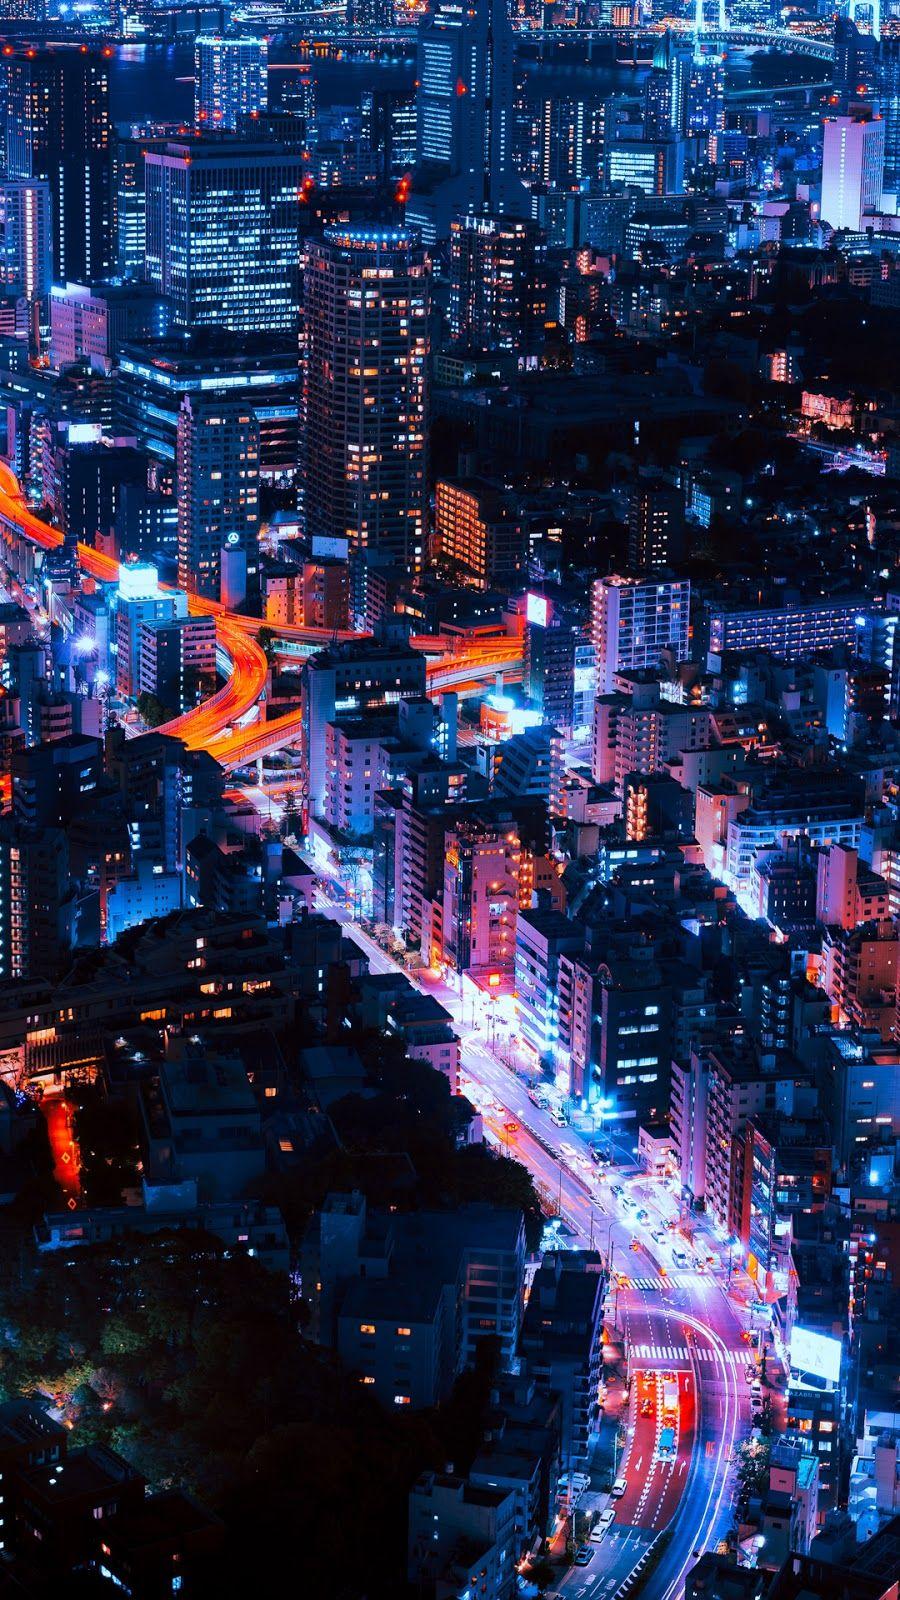 Tokyo night | Beautiful Wallpaper | Wallpaper, Hd wallpaper iphone, S8 wallpaper